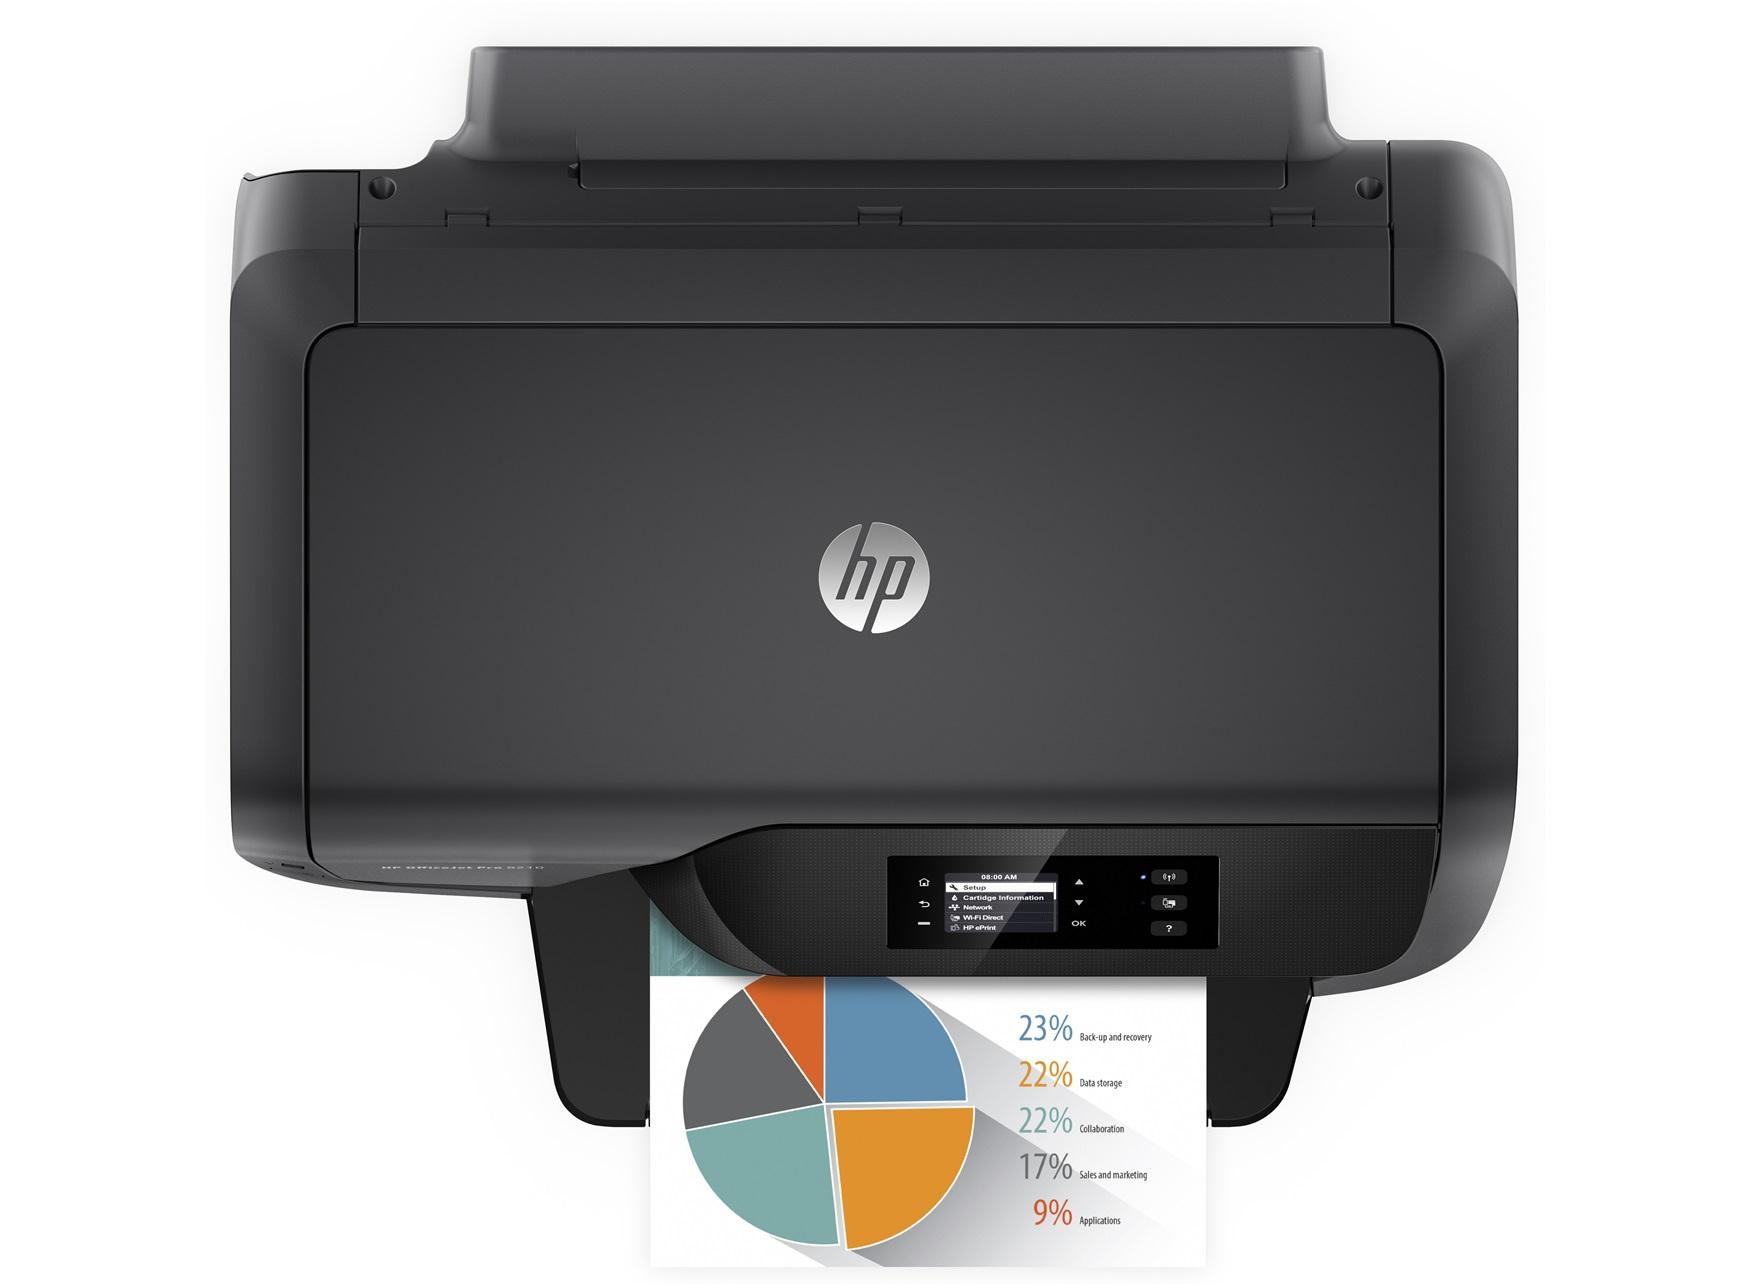 hp officejet pro 8210 inkjet printer colour 2400 x 1200 dpi a4 wi fi 532 in distributor. Black Bedroom Furniture Sets. Home Design Ideas